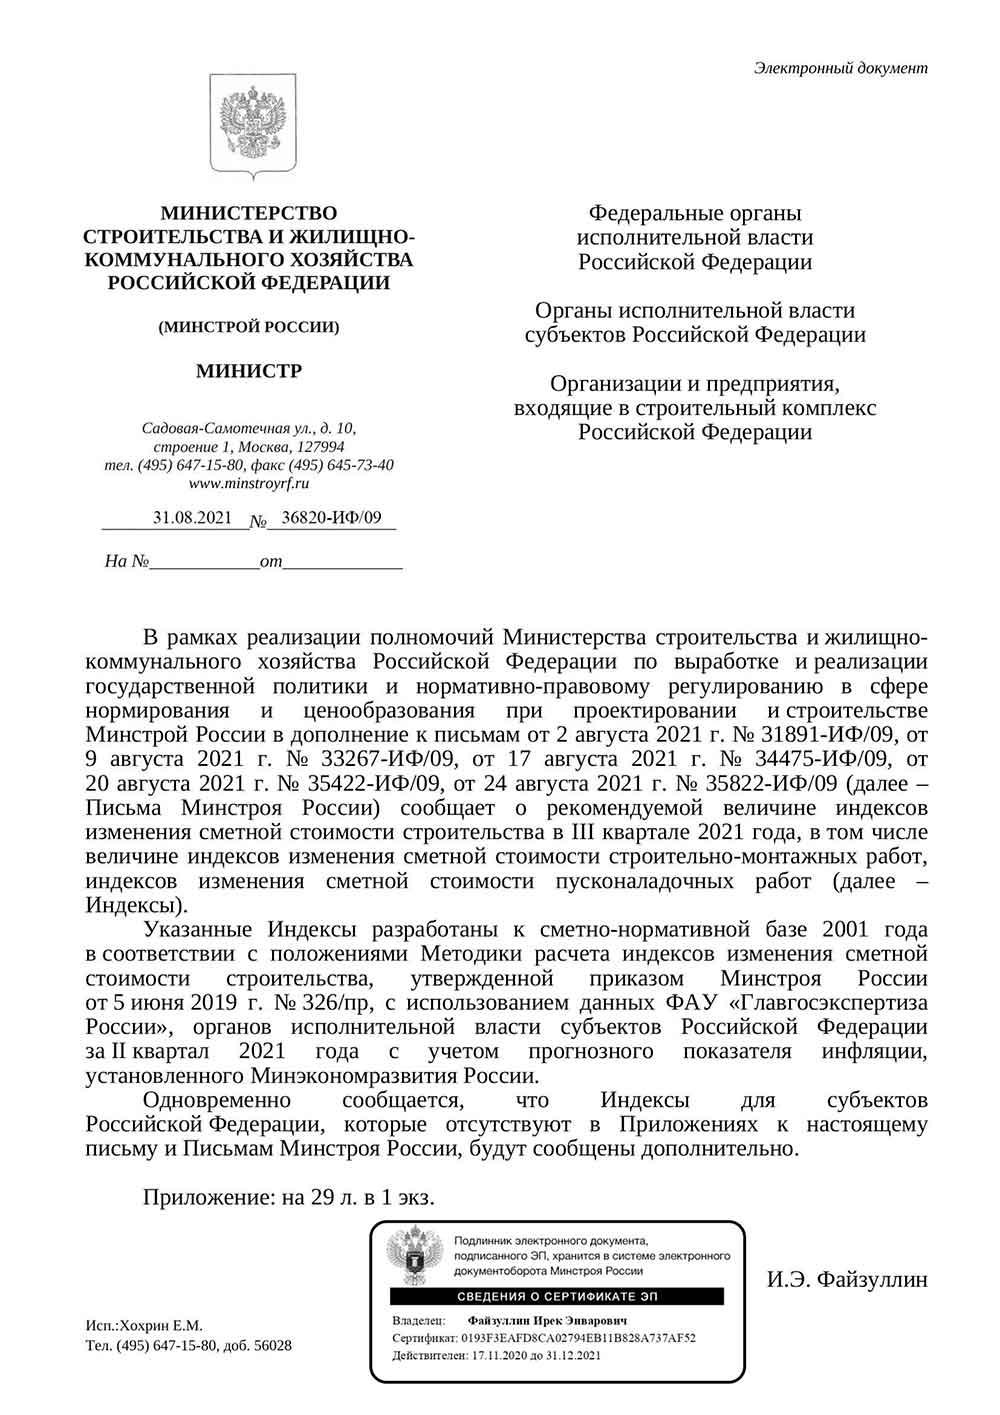 Письмо Минстроя РФ №36820-ИФ/09 от 31.08.2021 г.